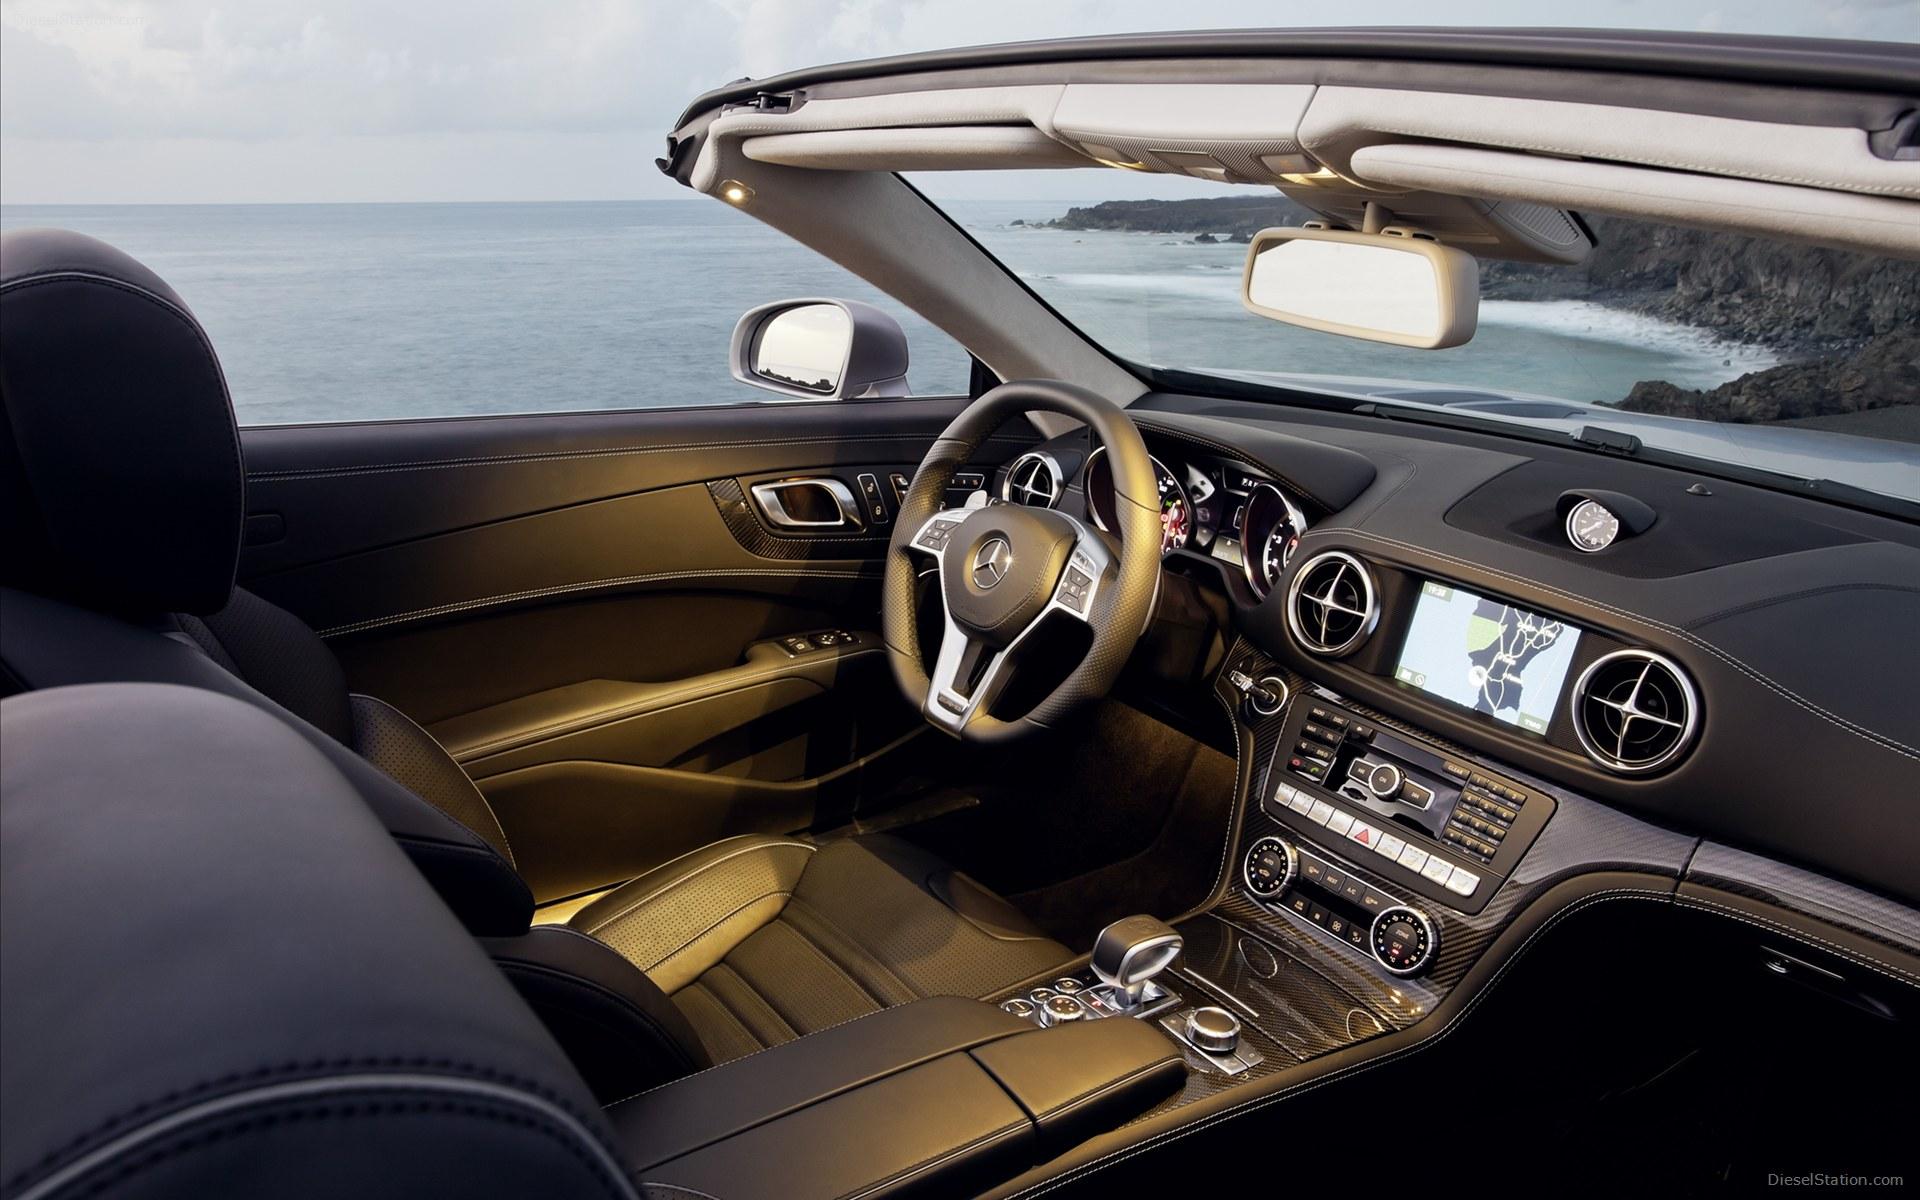 Mercedes Benz SL63 AMG3